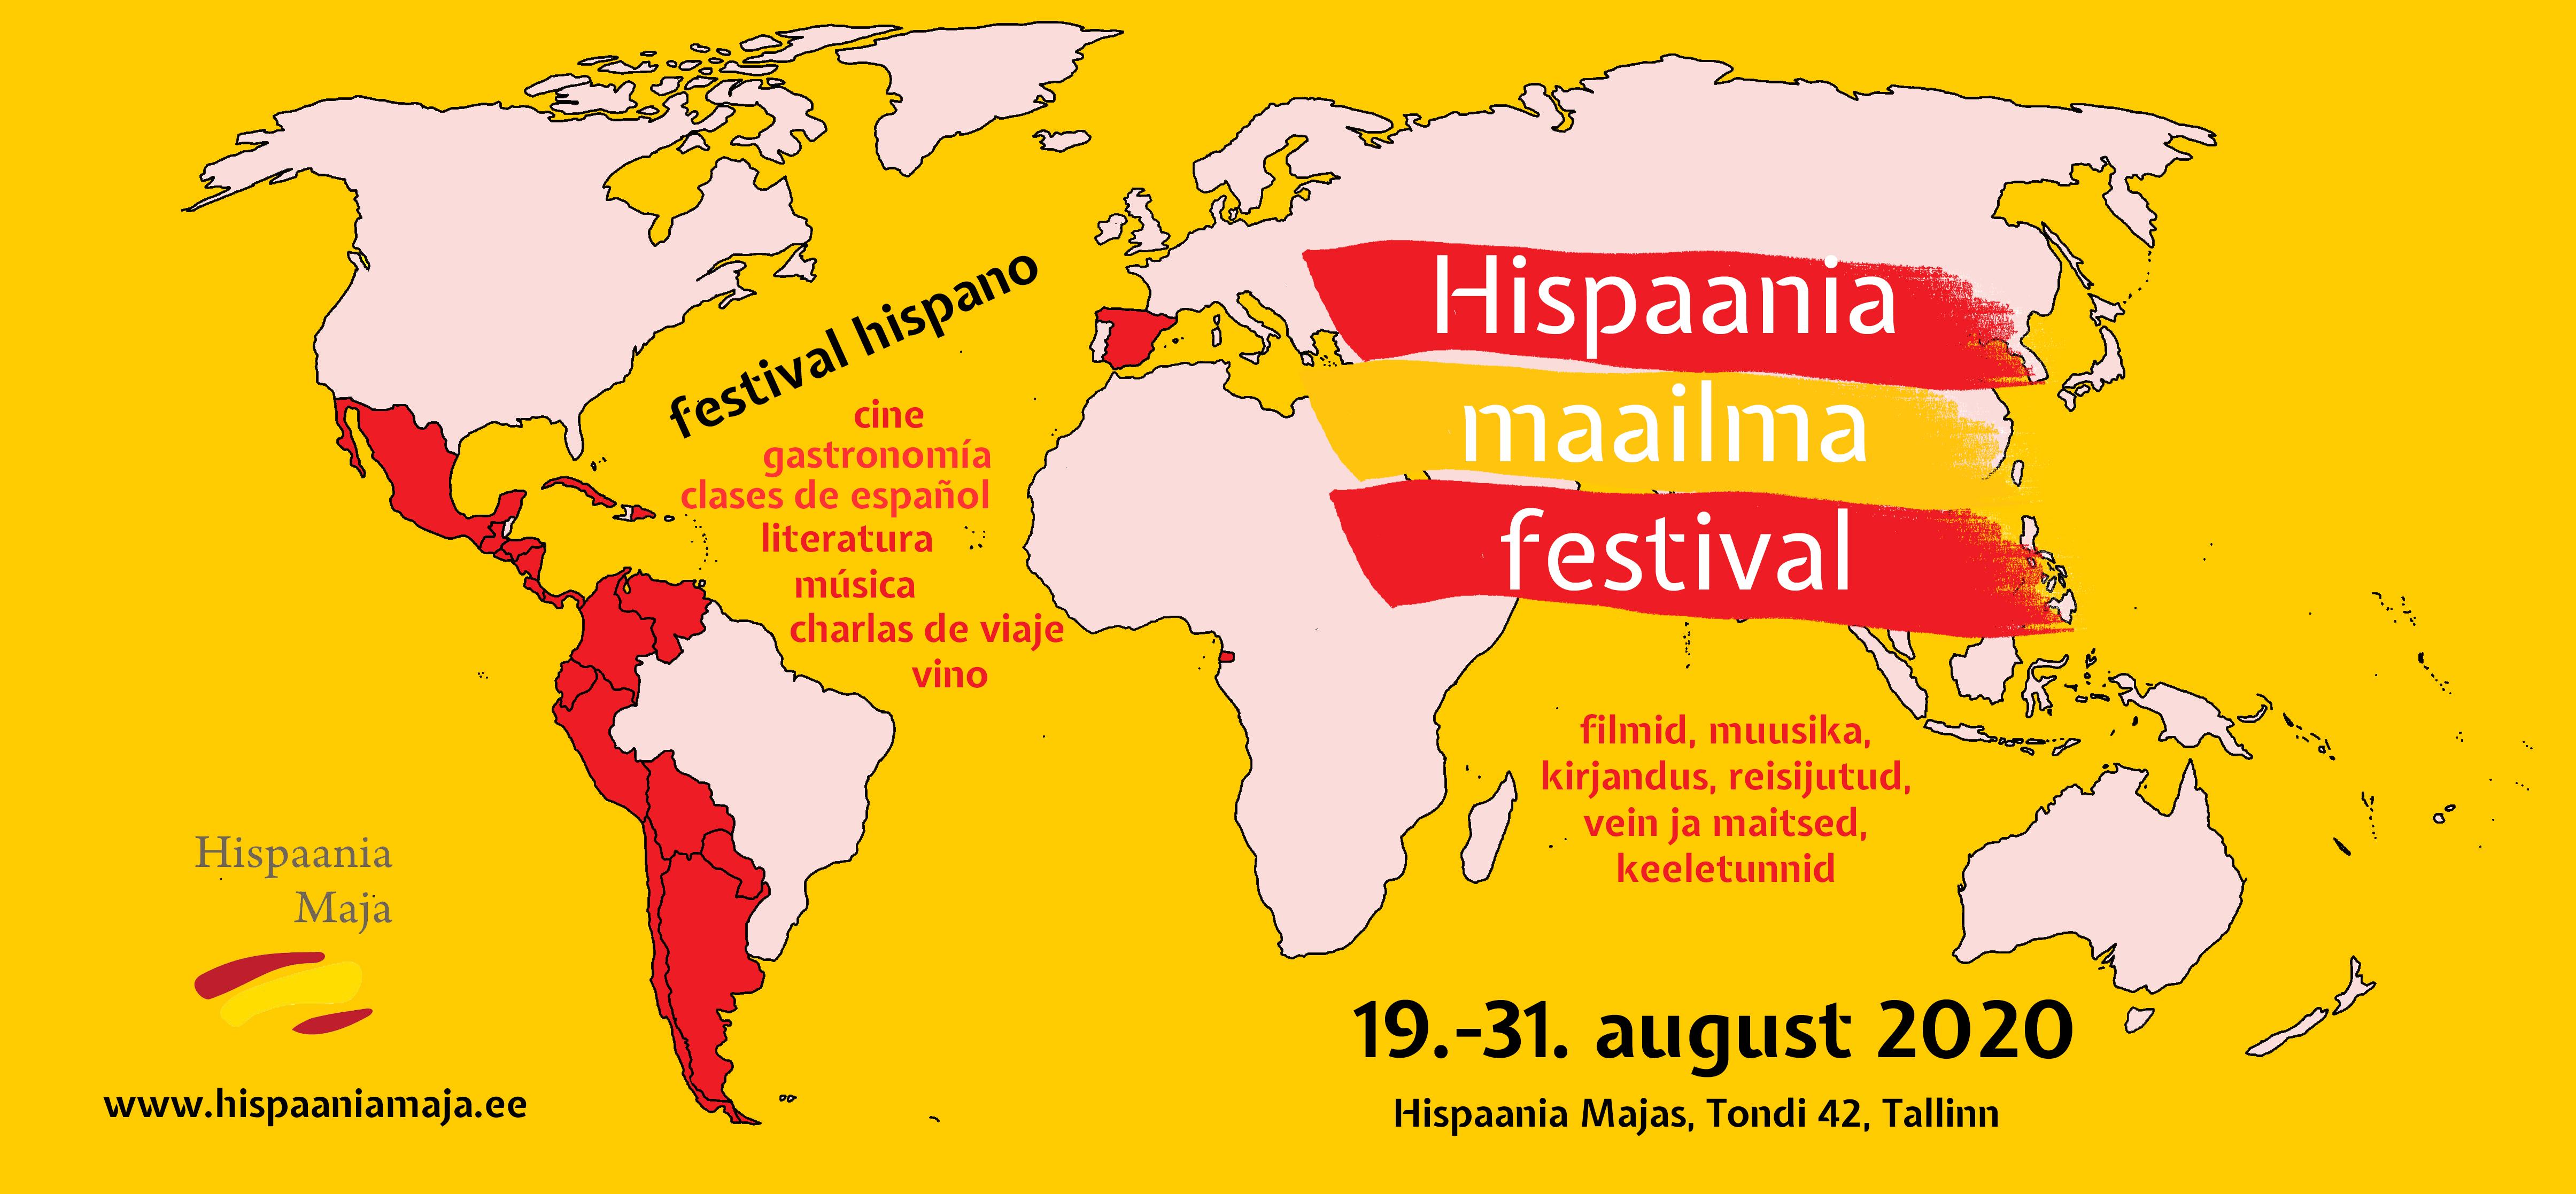 Hispaania maailma festival